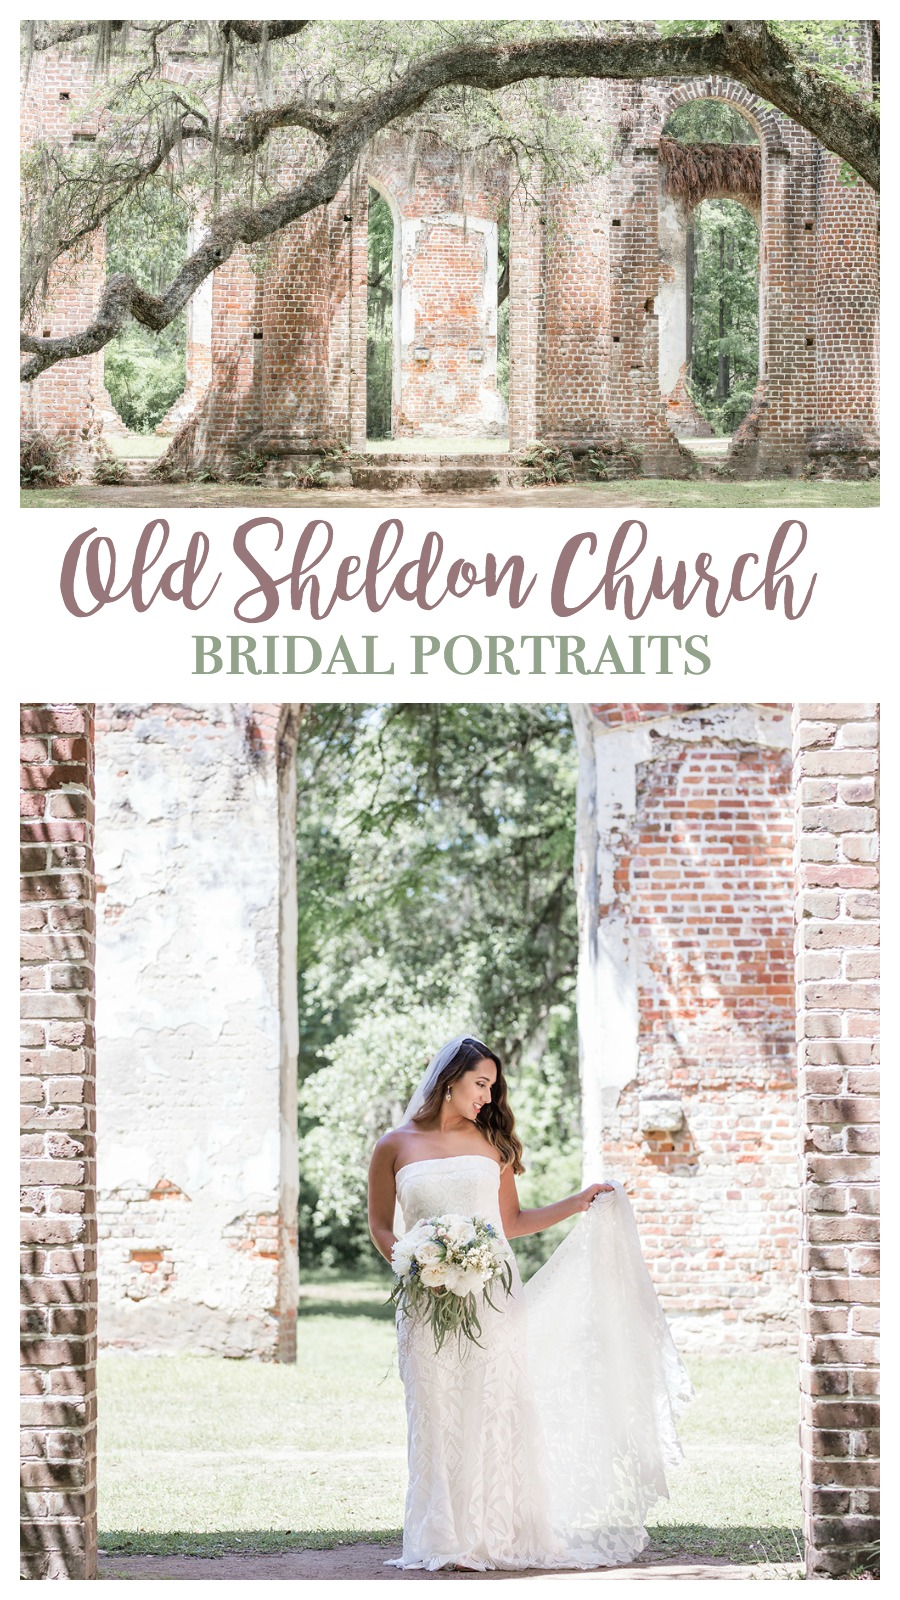 Natasha's Bridal Portraits at Old Sheldon Church Ruins, Yemassee, South Carolina | Palmetto State Weddings | Jenna Grace Photography | Charleston wedding photography | Southern wedding inspiration